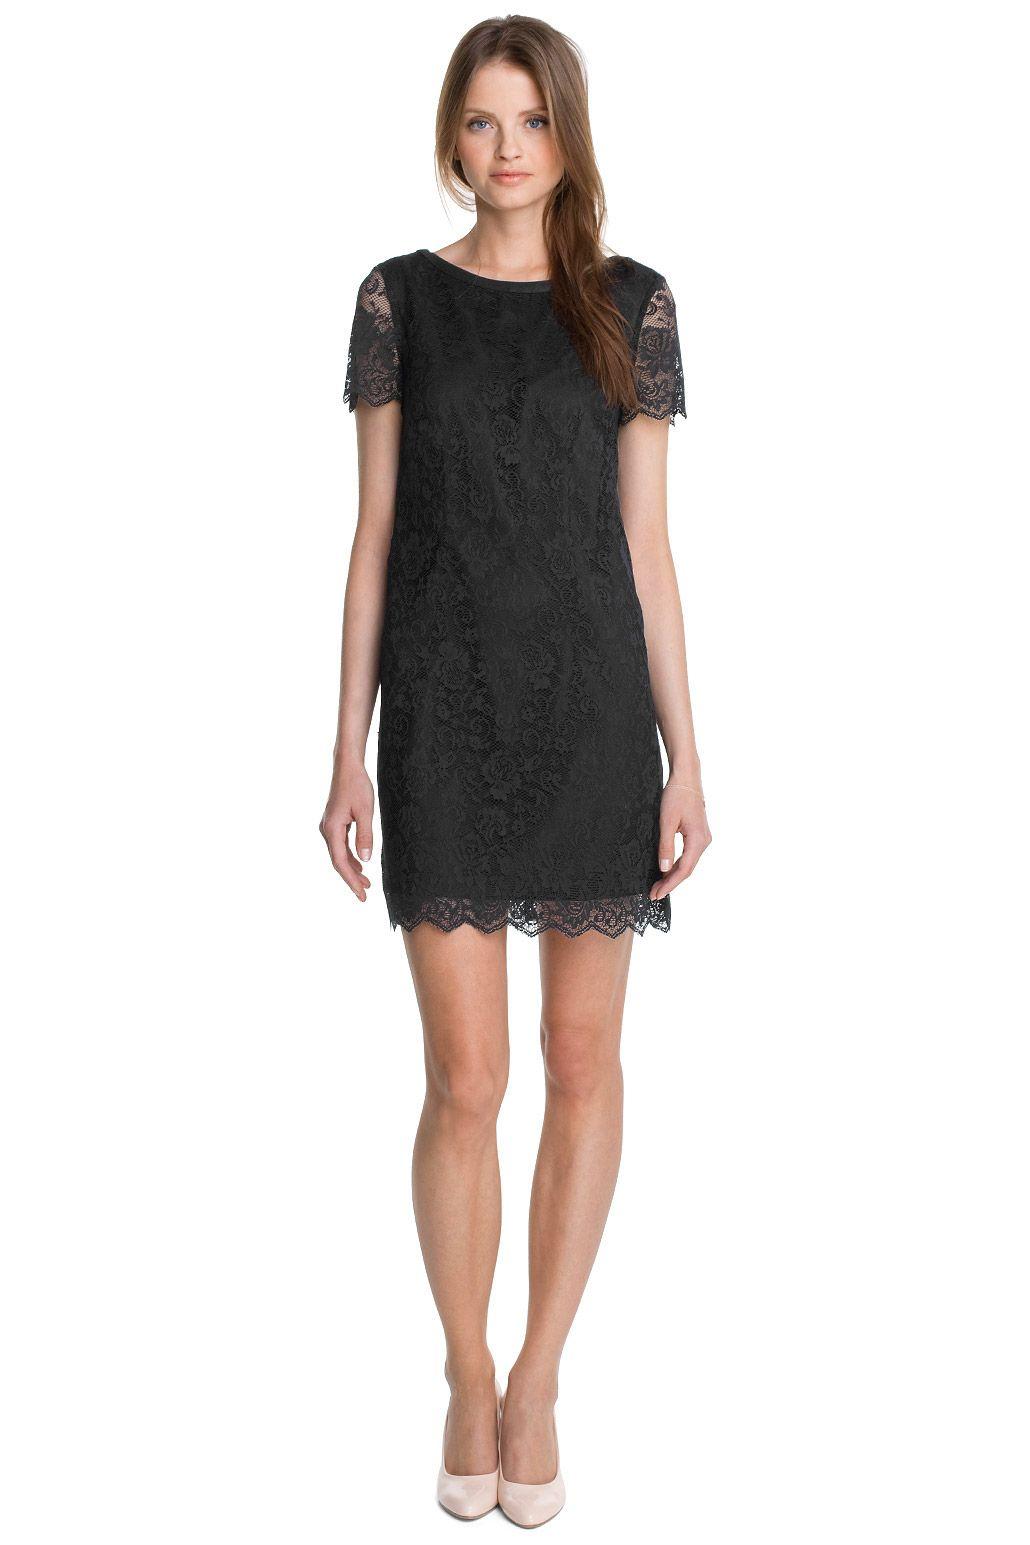 Esprit - Etui-Kleid aus Spitze  Kleid spitze, Outfit, Mode